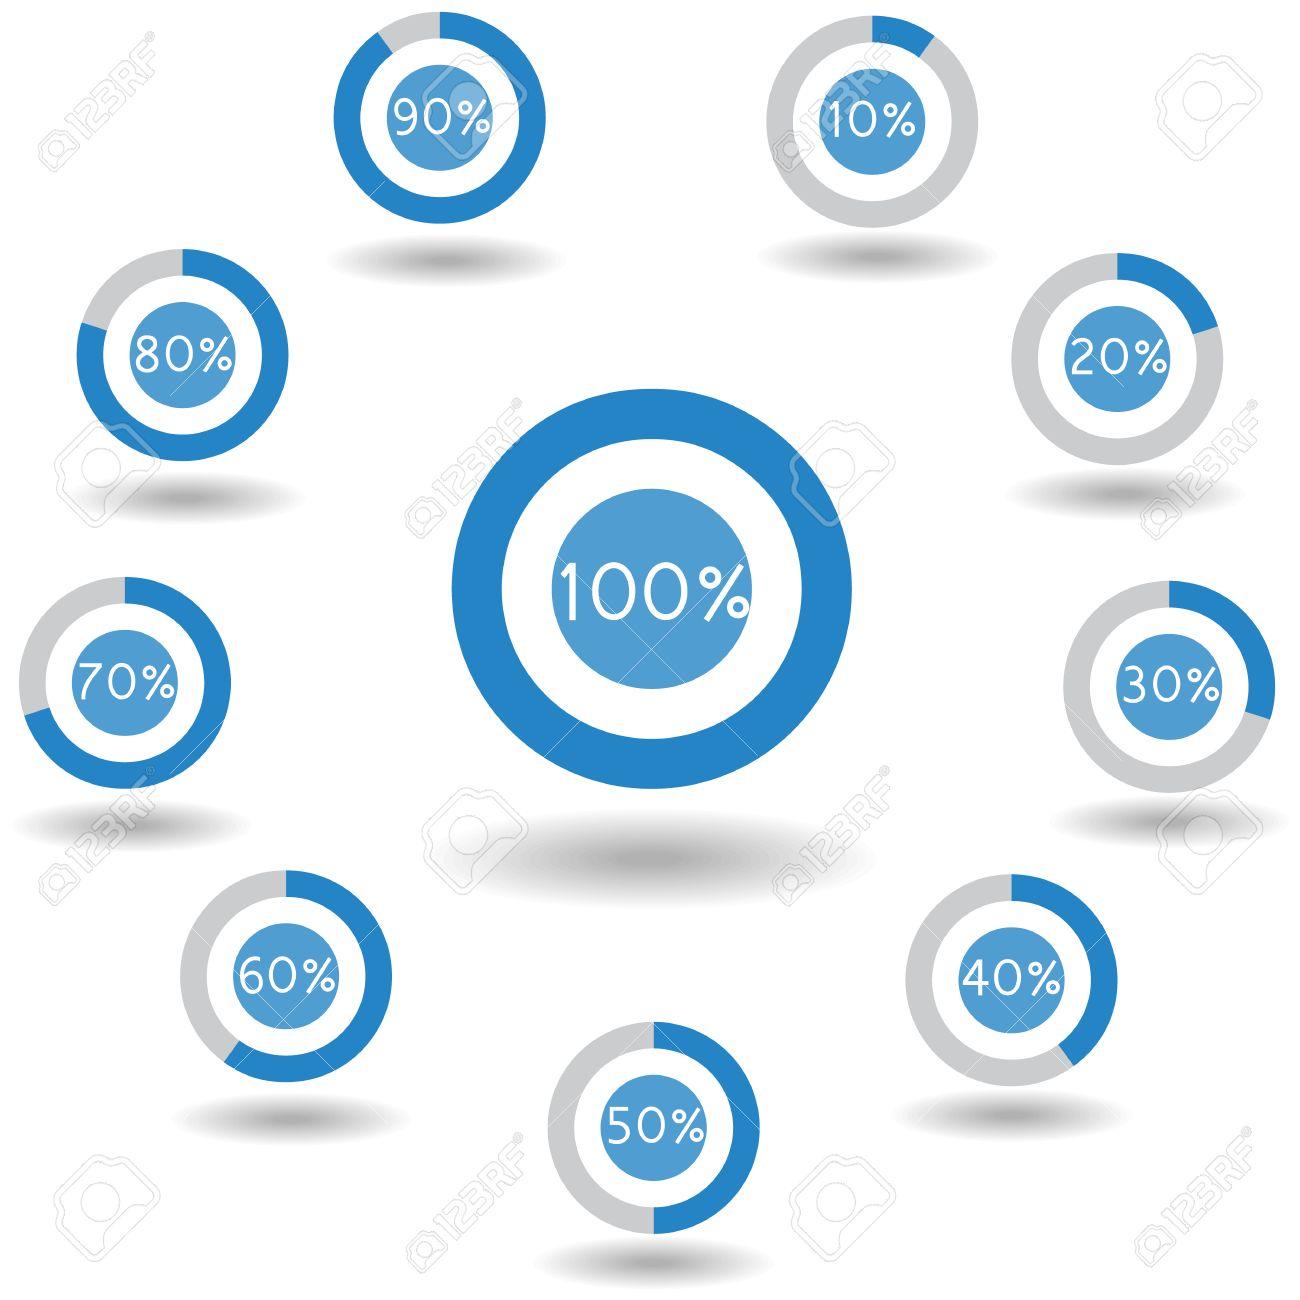 icons pie graph circle percentage blue chart 0 10 20 30 40 50